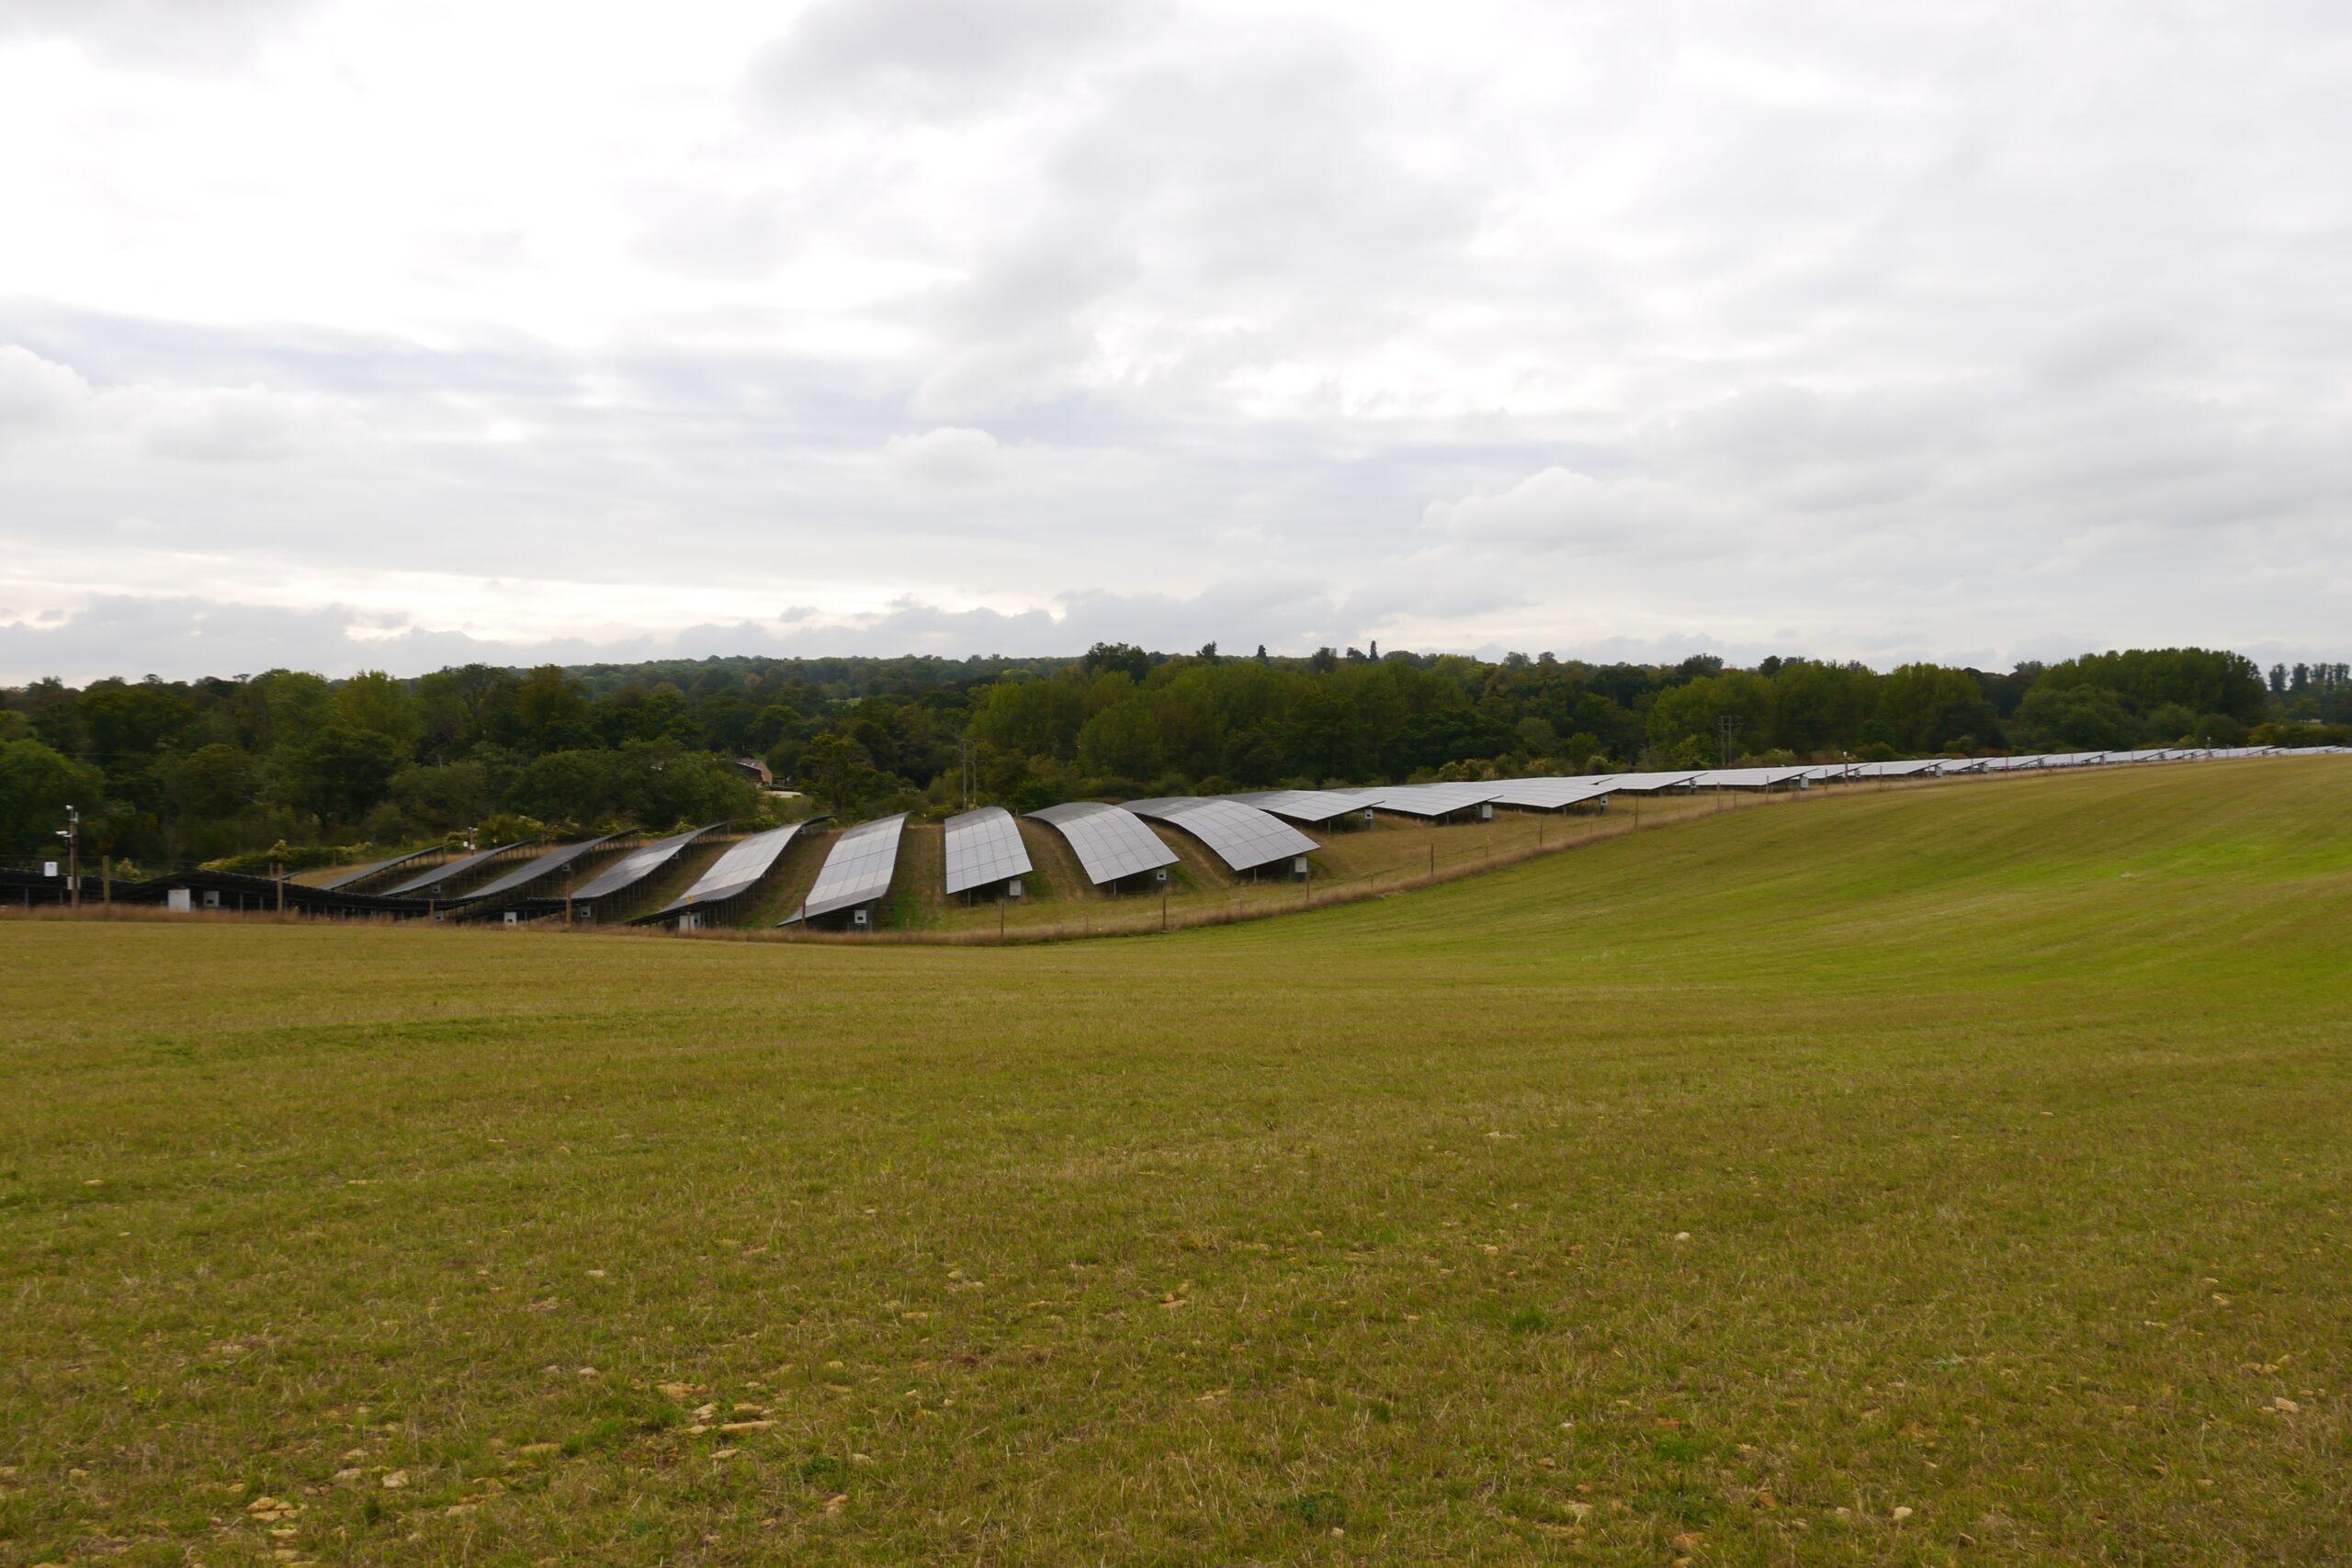 'Solar parks should fit in the landscape'